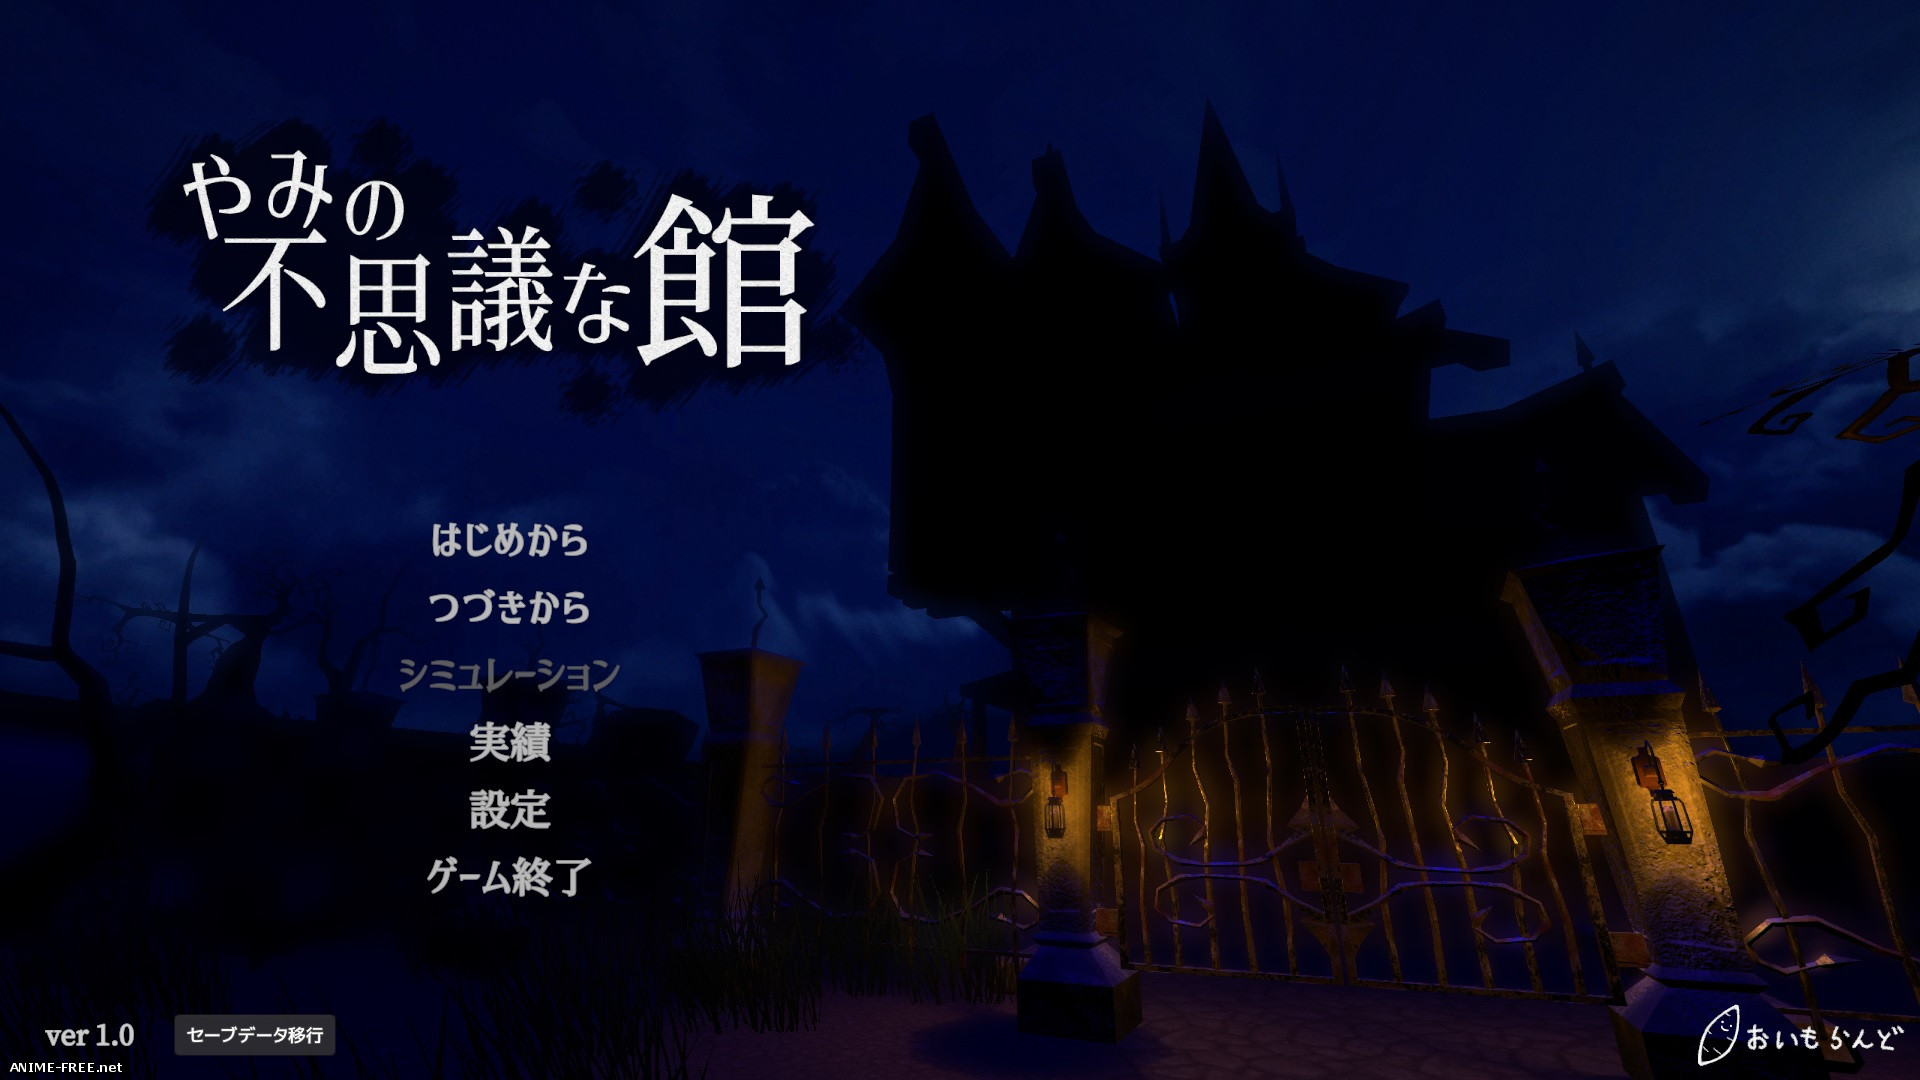 Yami's Wonder Mansion / Чудесный особняк Ями [2019] [Cen] [SLG, 3DCG] [JAP] H-Game